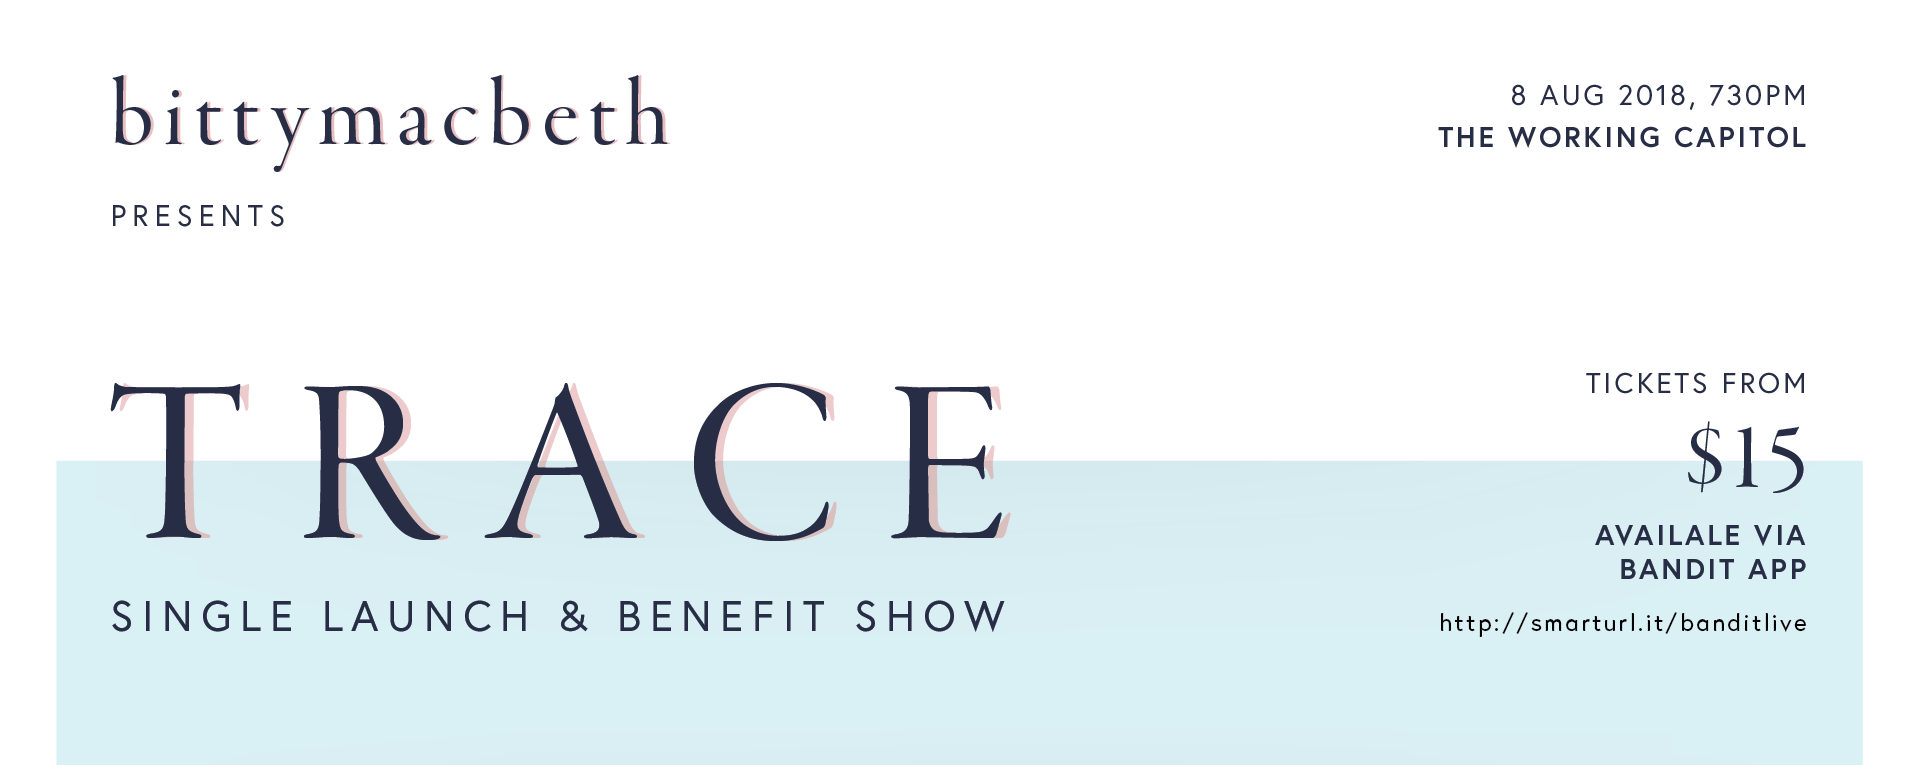 TRACE single launch & benefit show - bittymacbeth